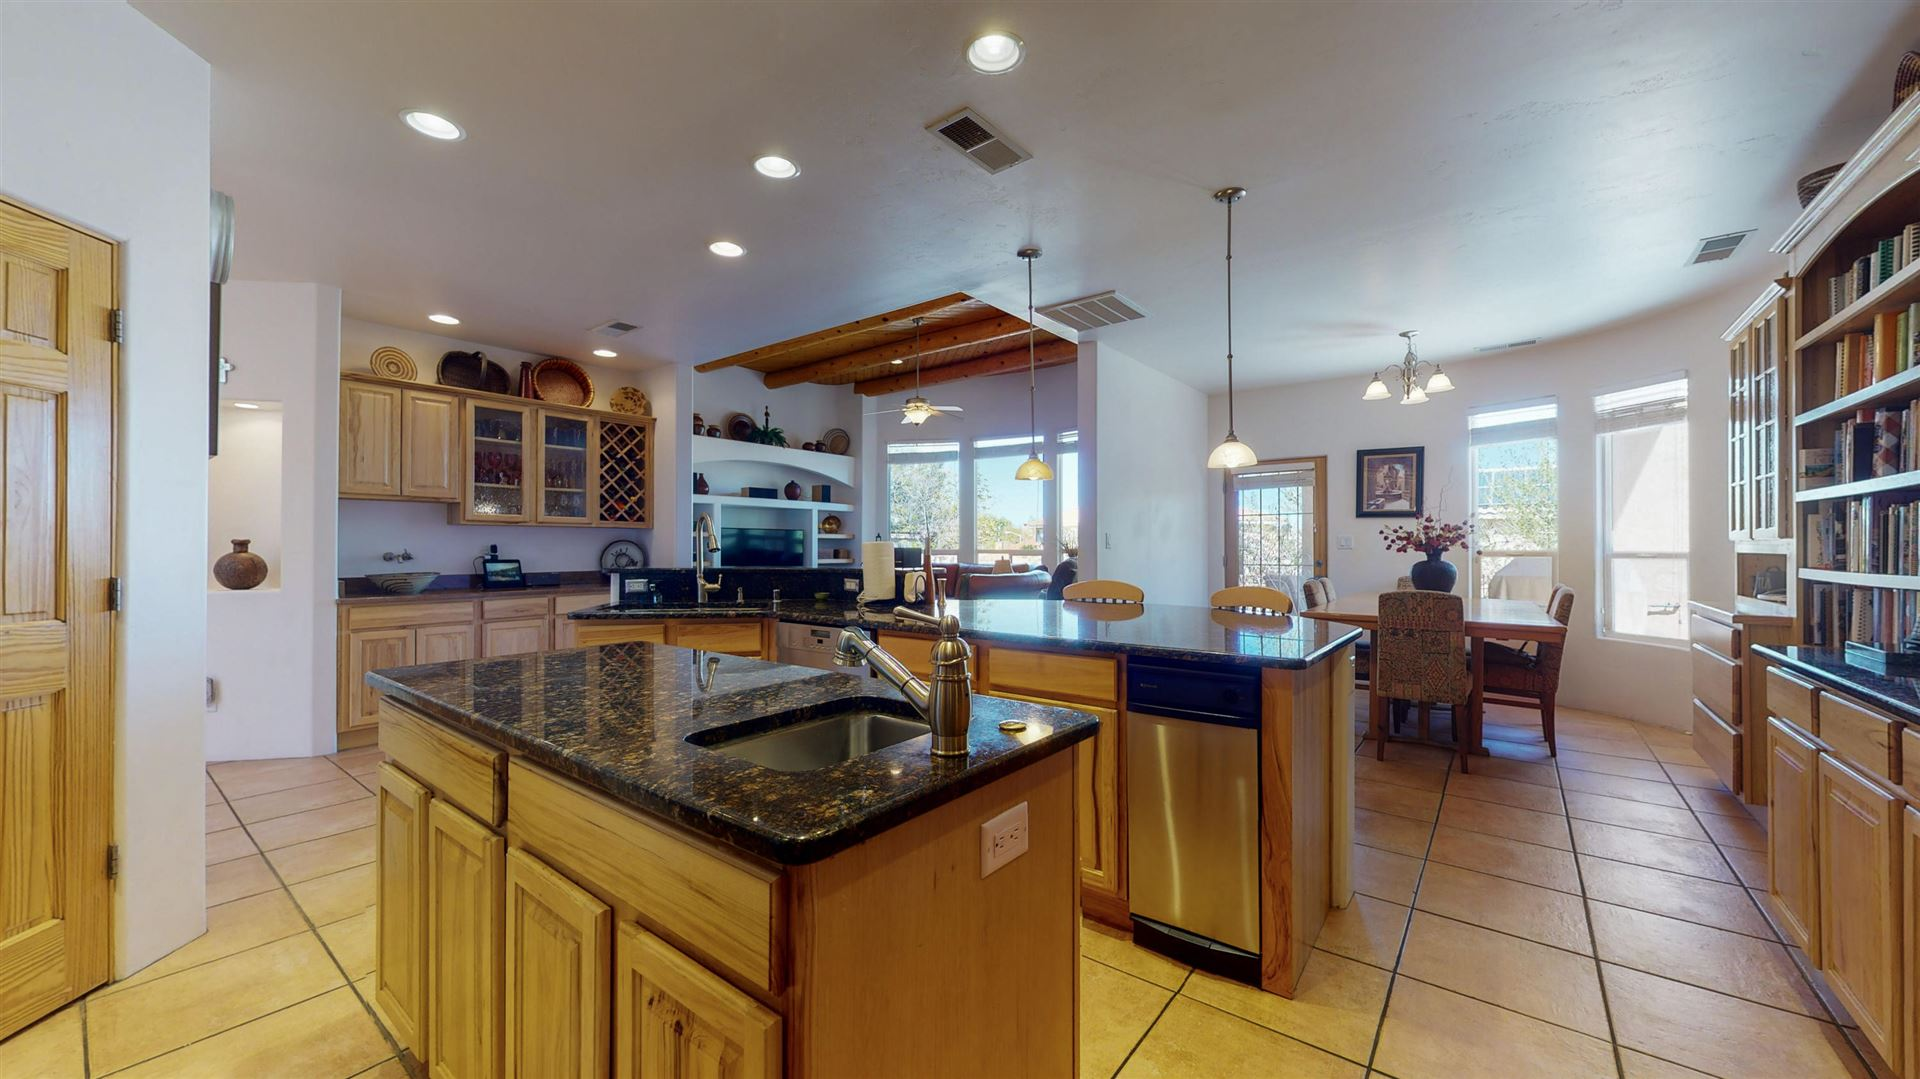 Photo of 1204 TECOLOTE Way SE, Rio Rancho, NM 87124 (MLS # 966519)